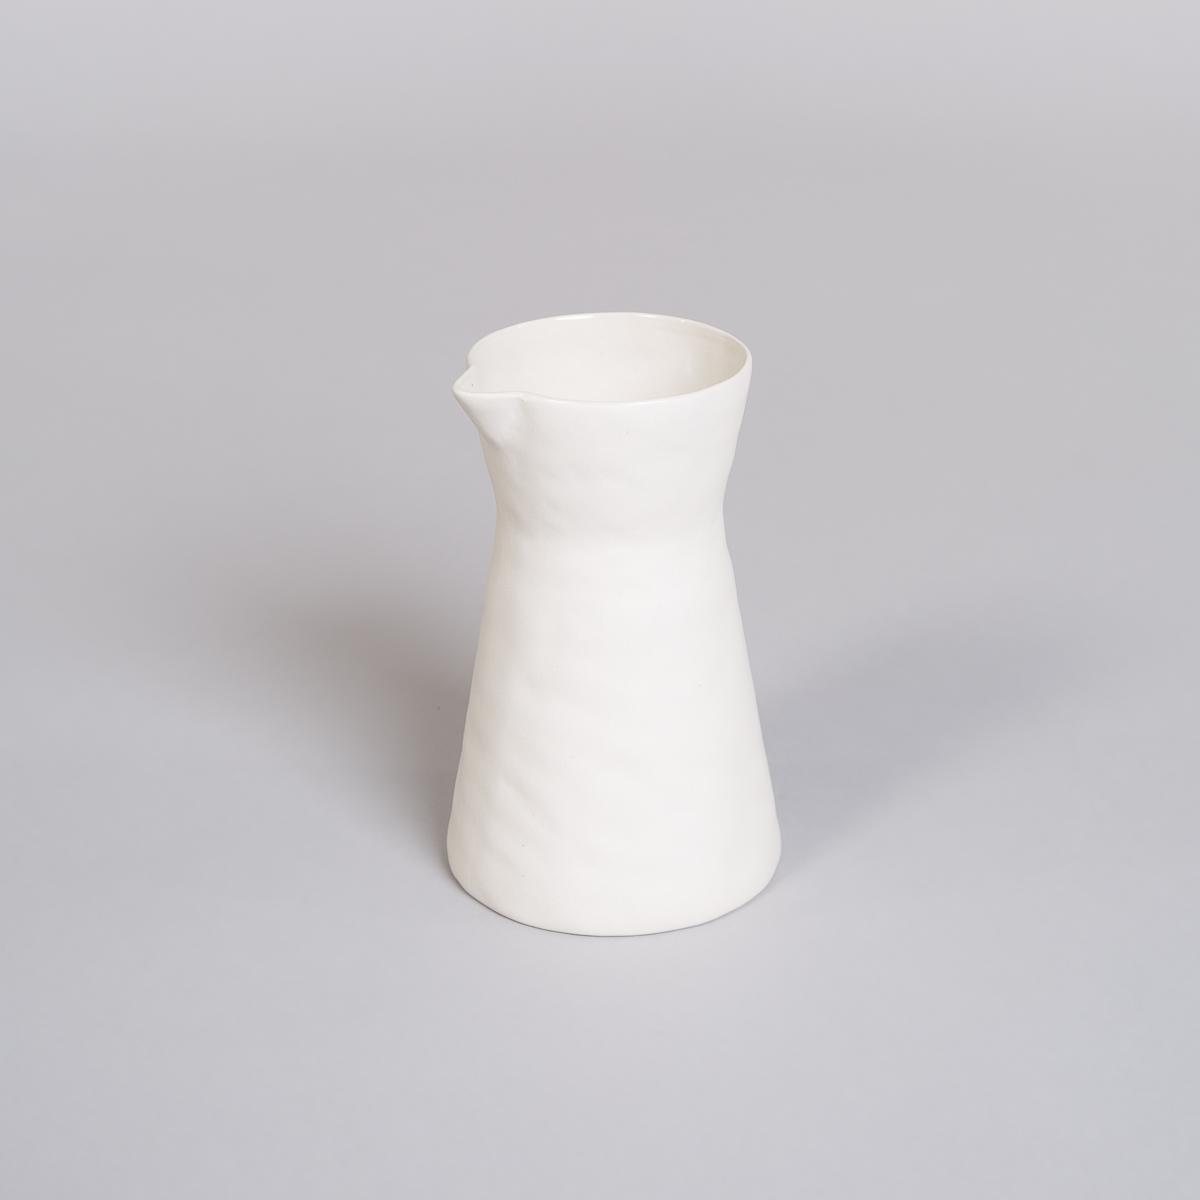 Mugge i Porselen - Kremfarget-0